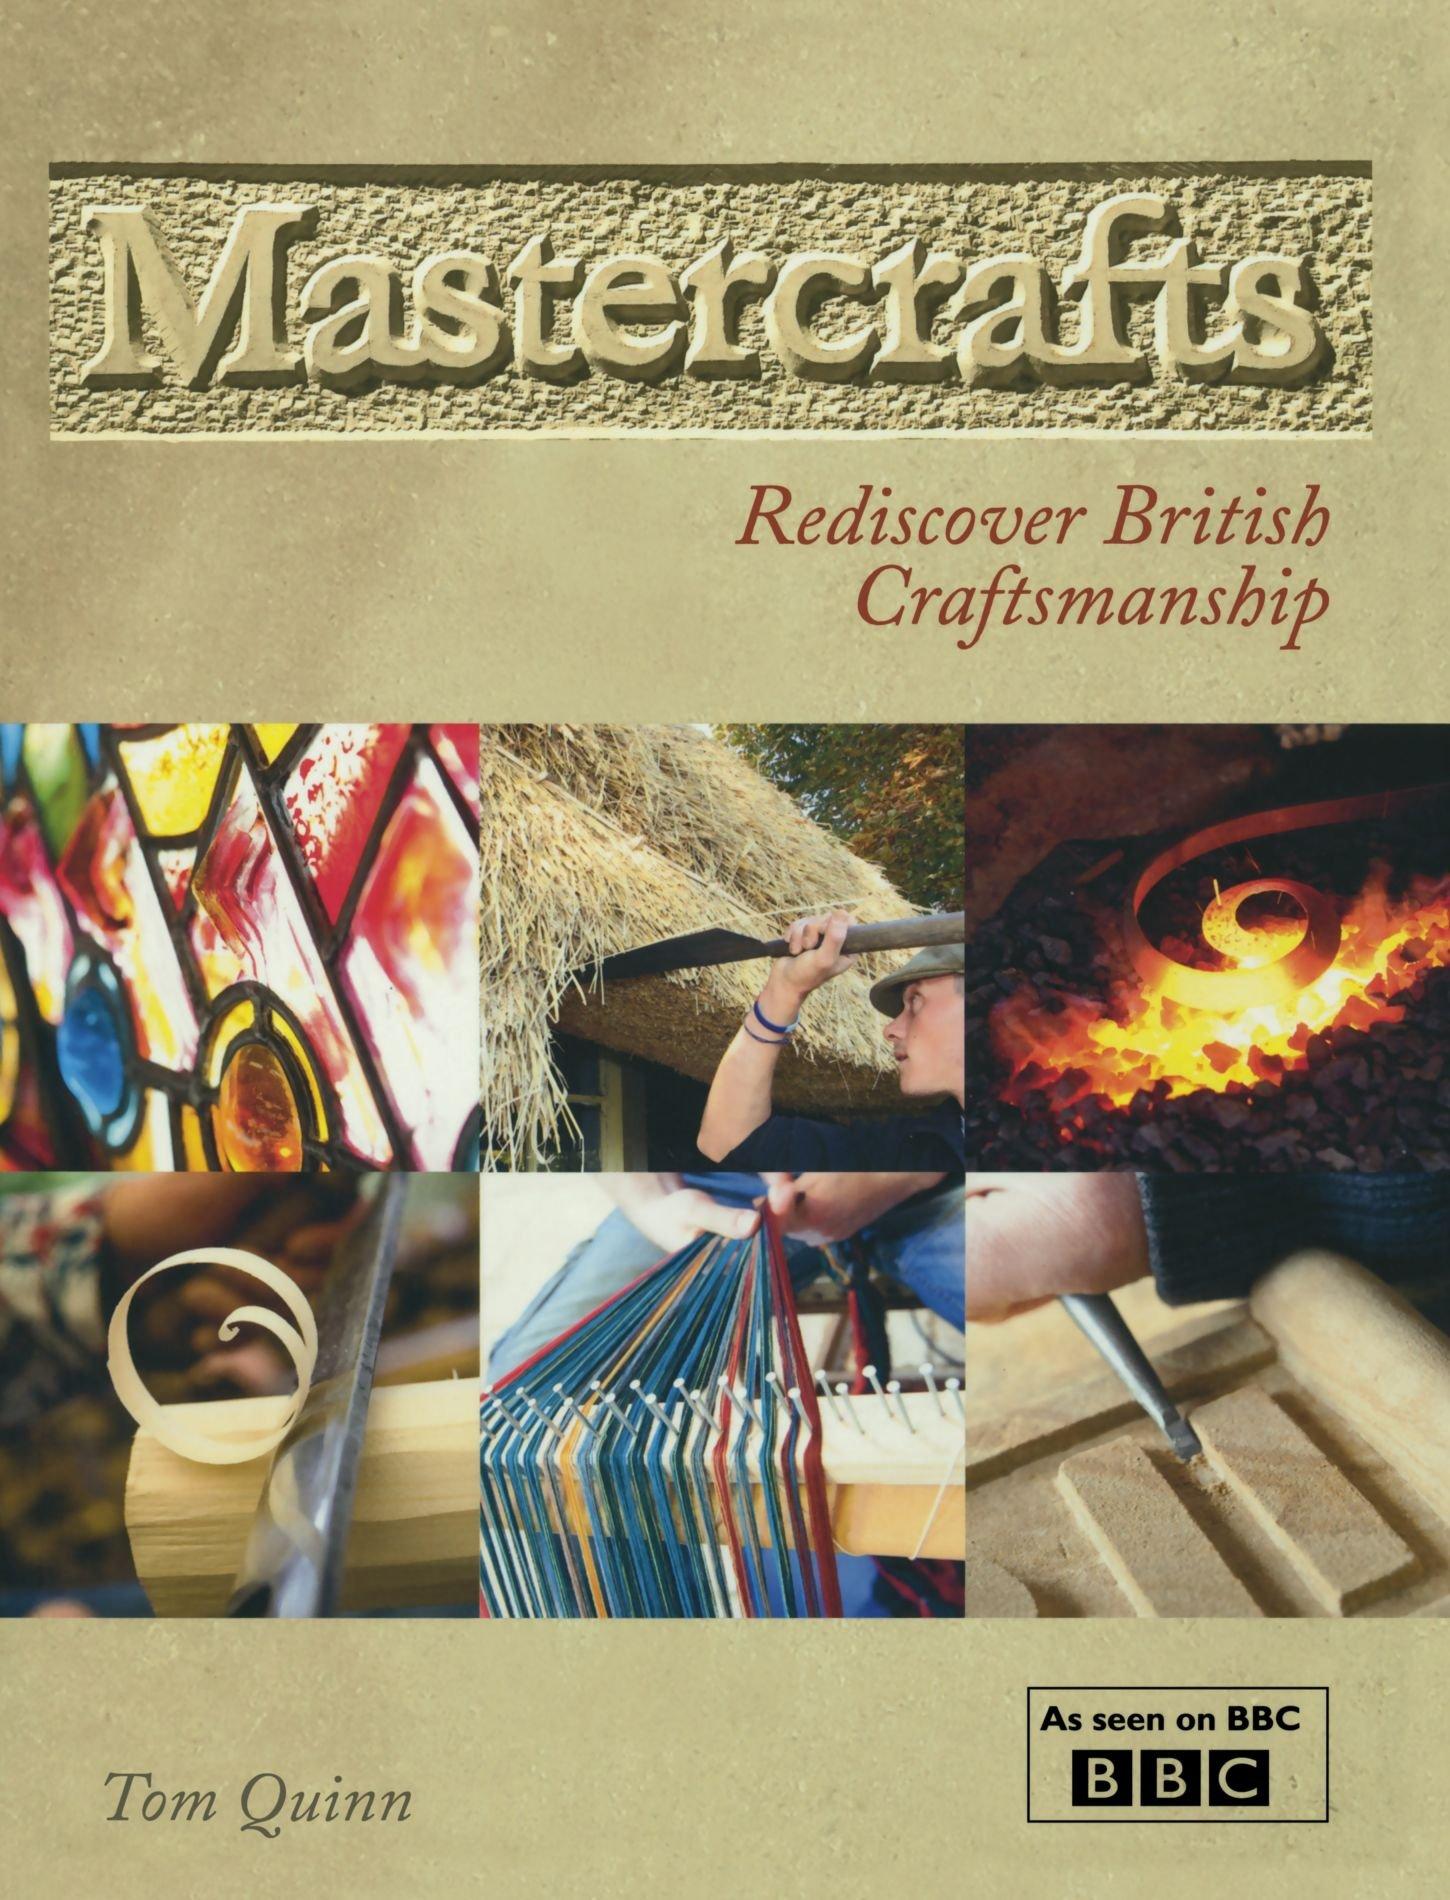 Mastercrafts: Rediscover British Craftsmanship. Tom Quinn